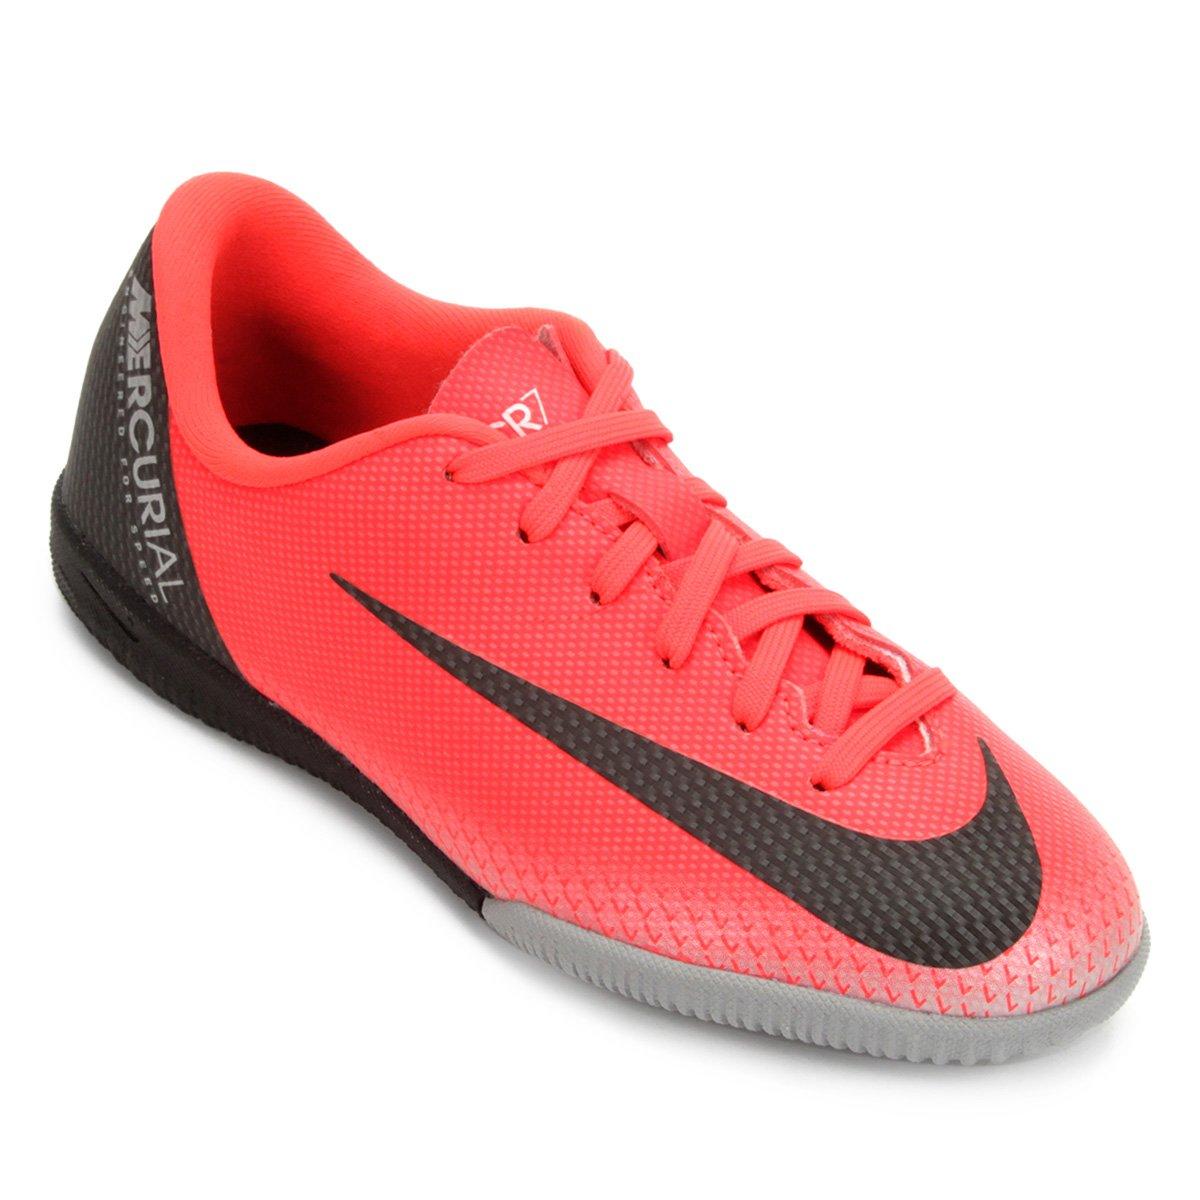 50fcb98ad3 Chuteira Futsal Infantil Nike Mercurial Vapor 12 Academy GS CR7 IC -  Vermelho e Cinza